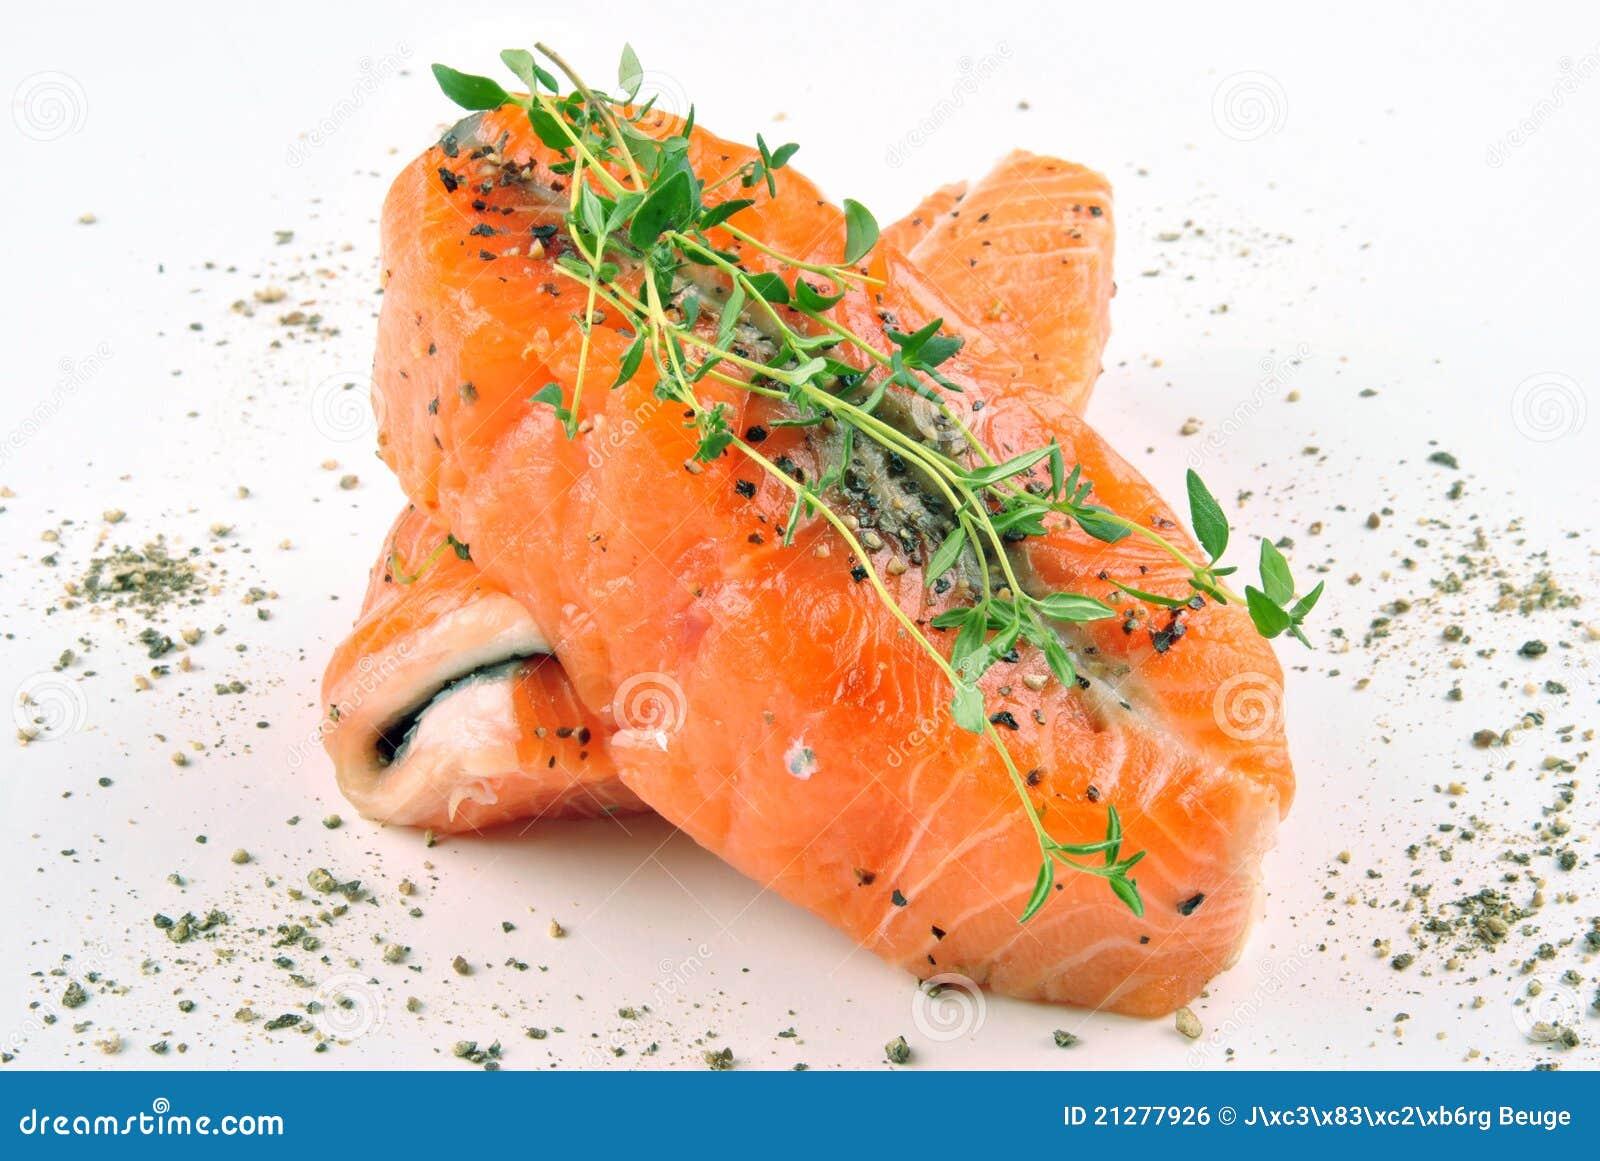 how to make salmon steak